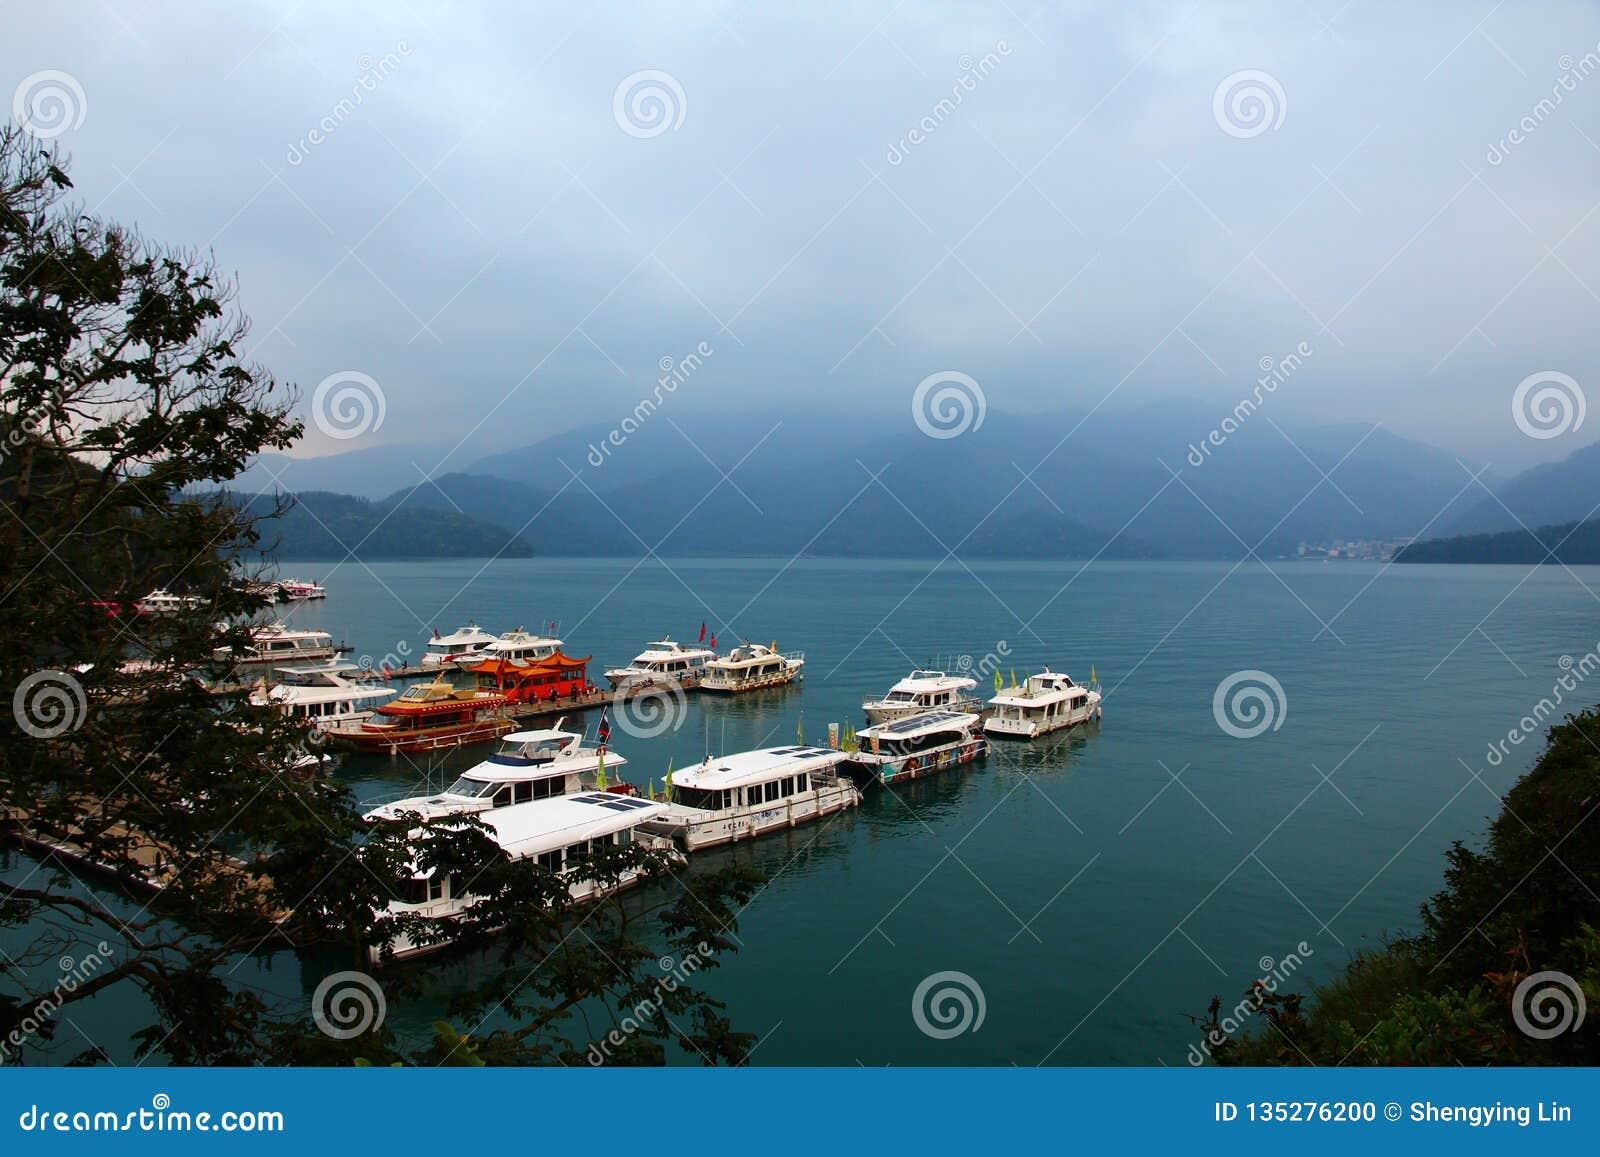 Landscape of Sun-Moon Lake in Taiwan